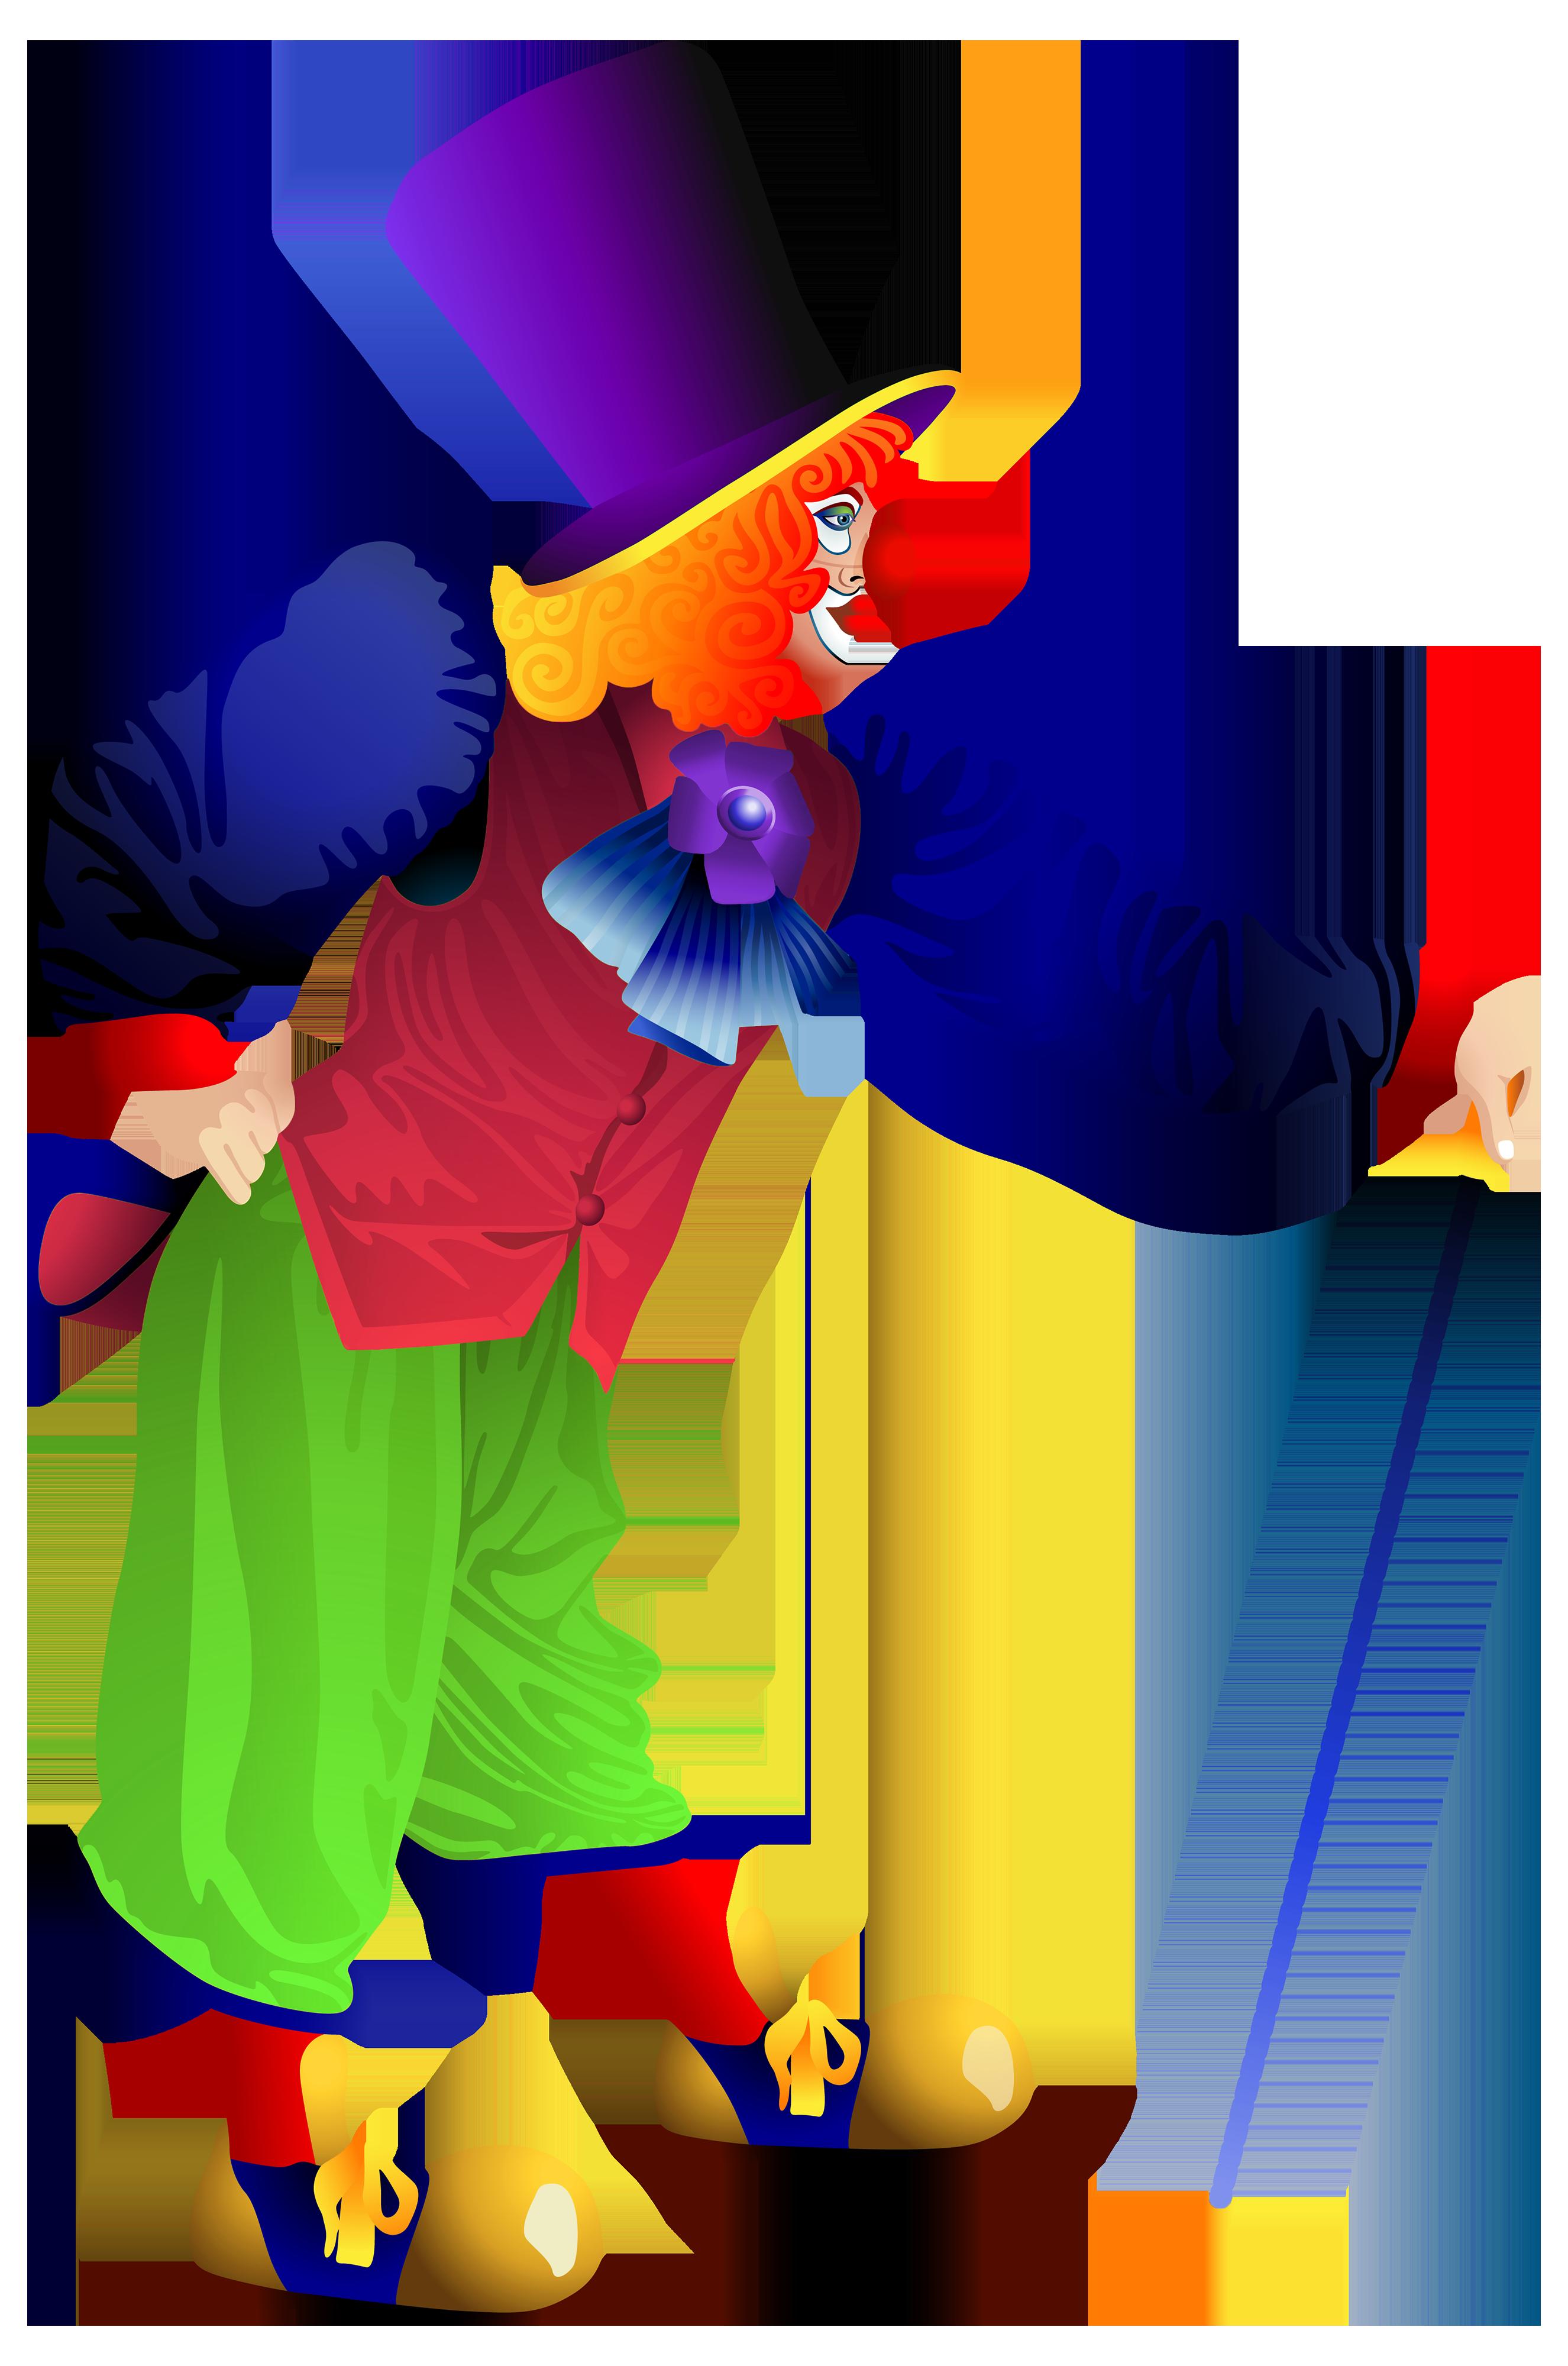 Clown clipart bow. Transparent png clip art